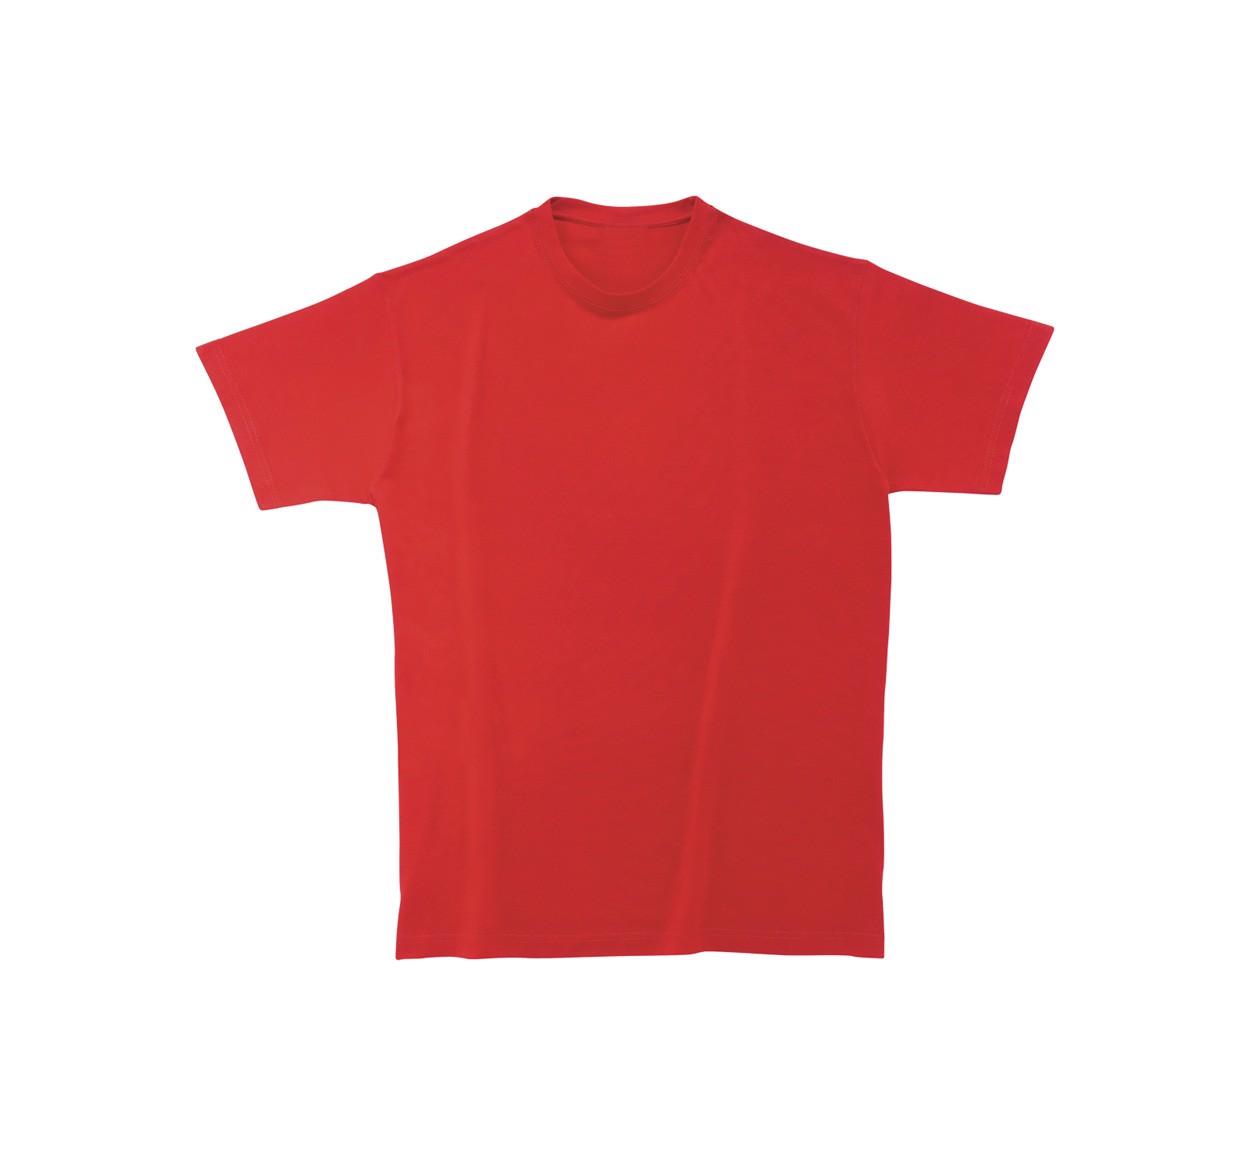 Tričko Heavy Cotton - Červená / XXL